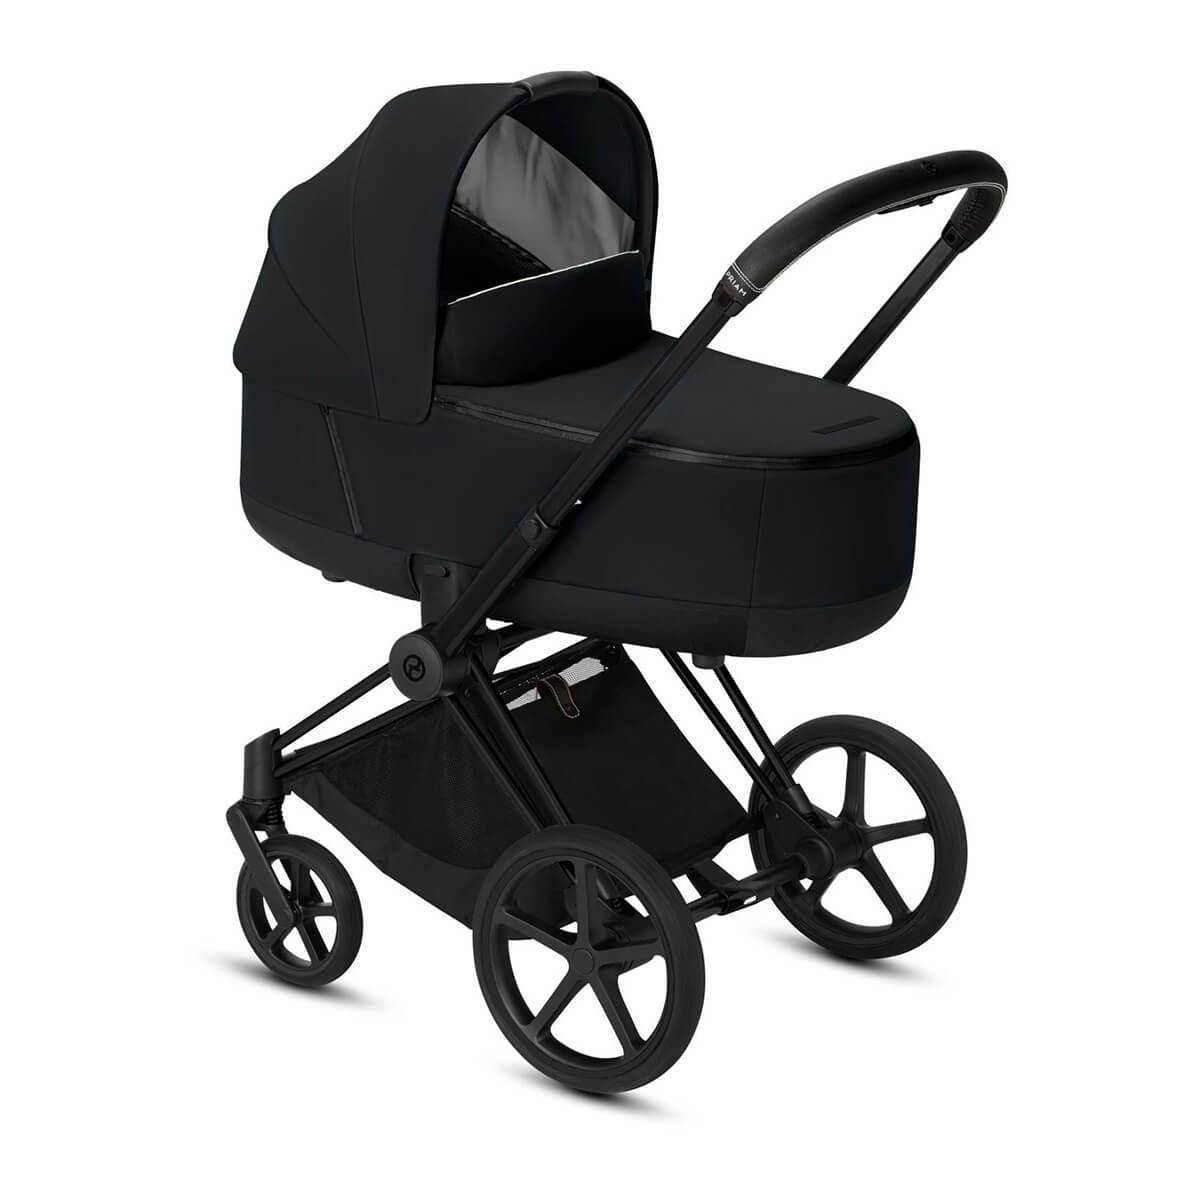 Цвета Cybex Priam для новорожденных Коляска для новорожденных Cybex Priam III Premium Black на шасси Matt Black cybex-priam-iii-premium-black-frame-matt-black.jpg